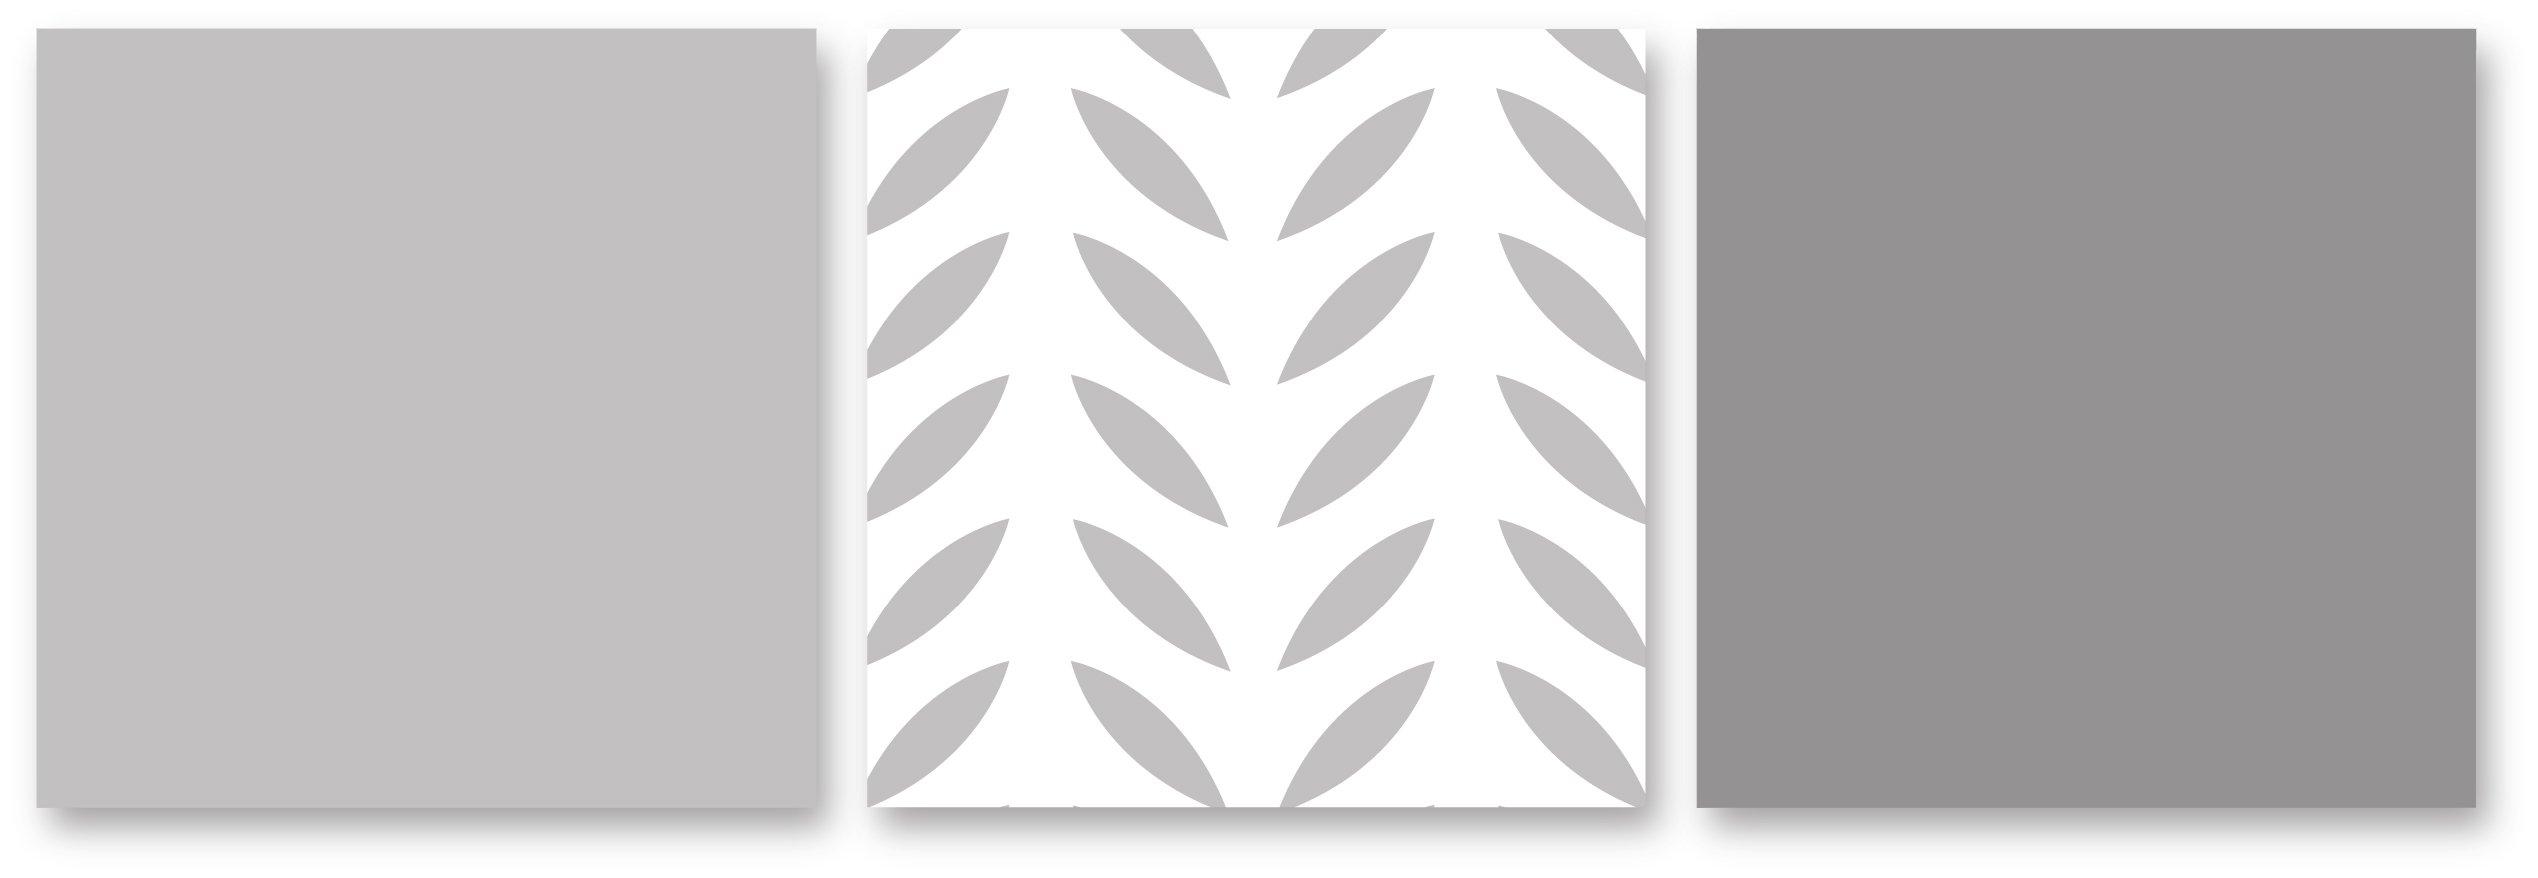 Sweet Jojo Designs 3-Piece Grey Gold and White Forest Deer and Dandelion Girl or Boy Full/Queen Bedding Children's Bedding Set by Sweet Jojo Designs (Image #4)